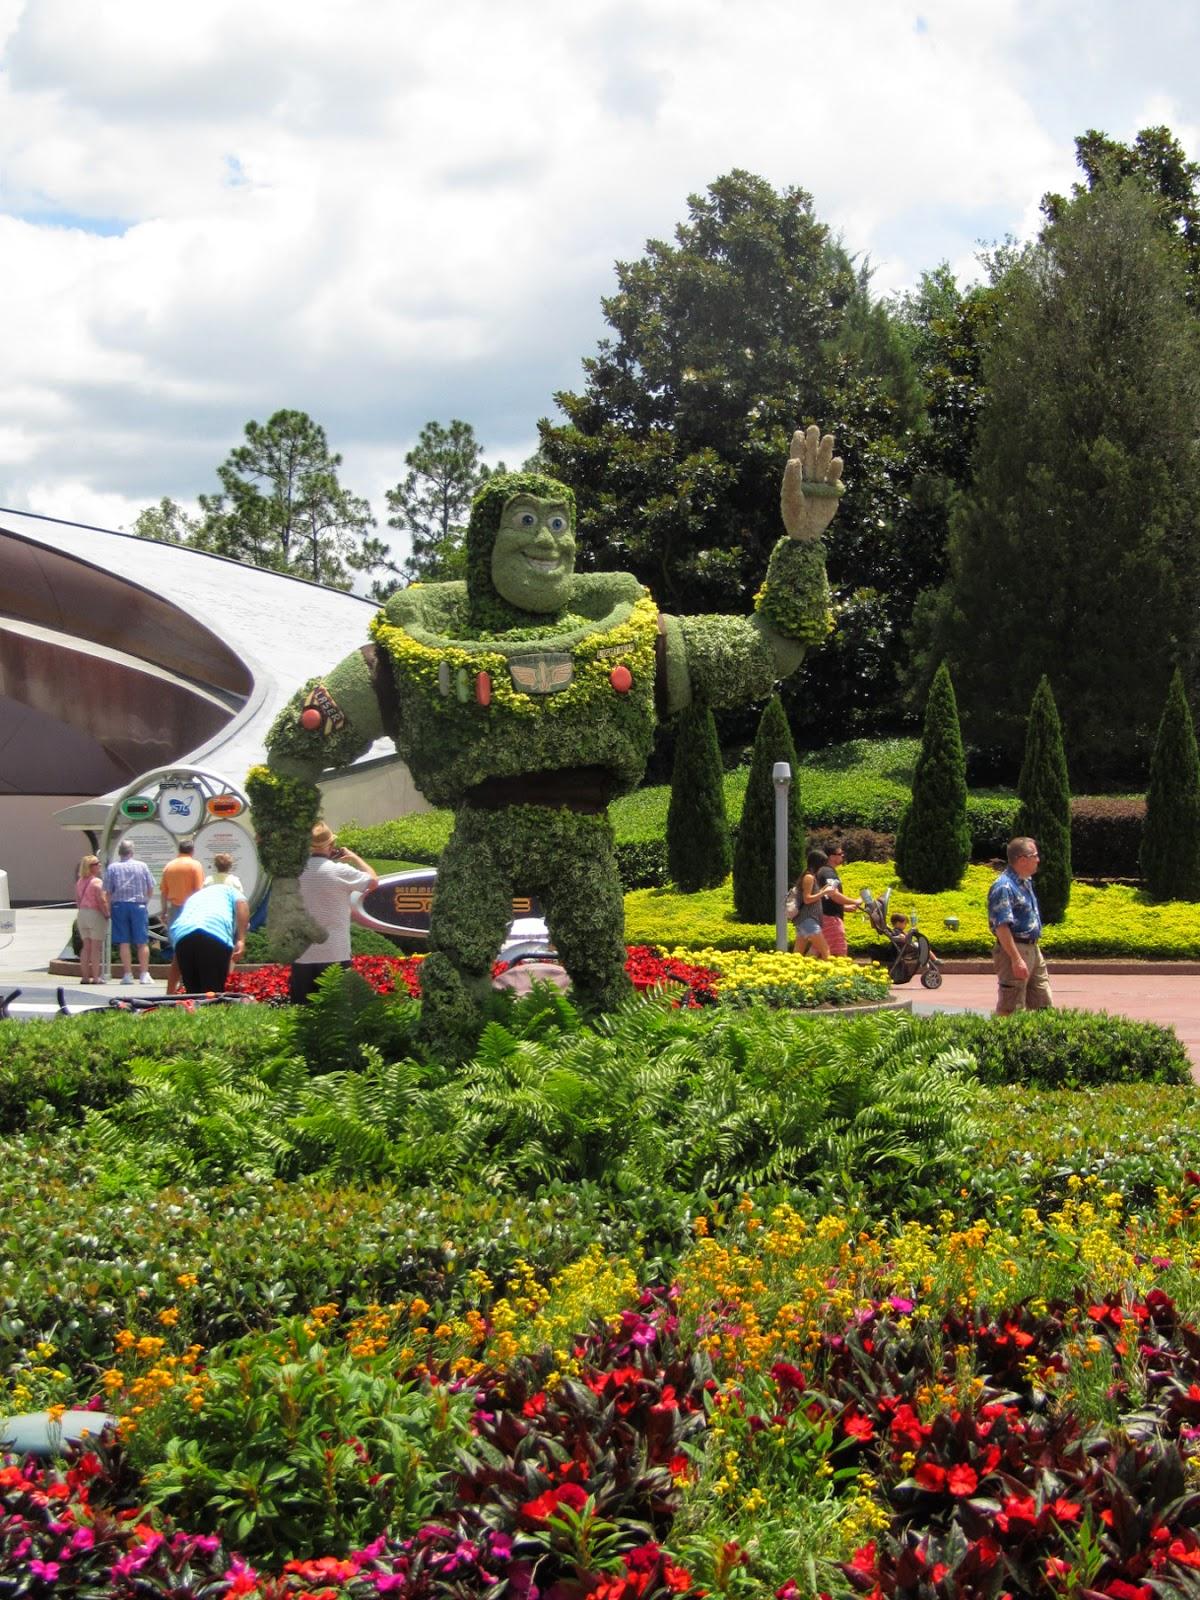 Exceptional Petitti Garden Center Job Fair Further Inspiration Article